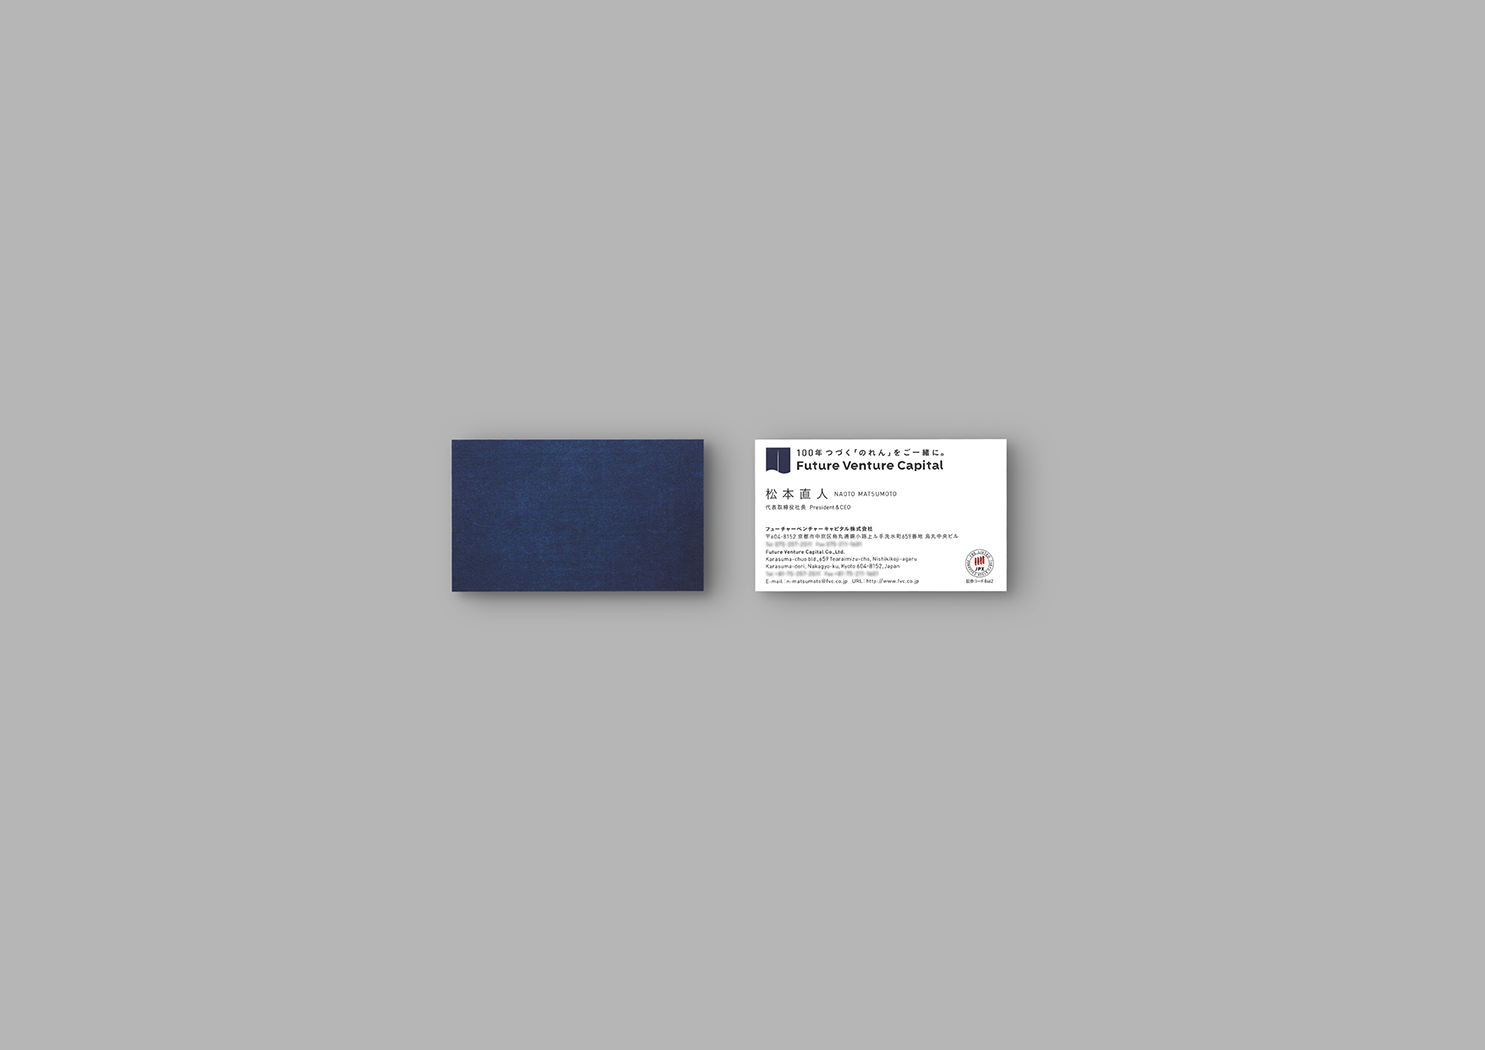 fvc Business card